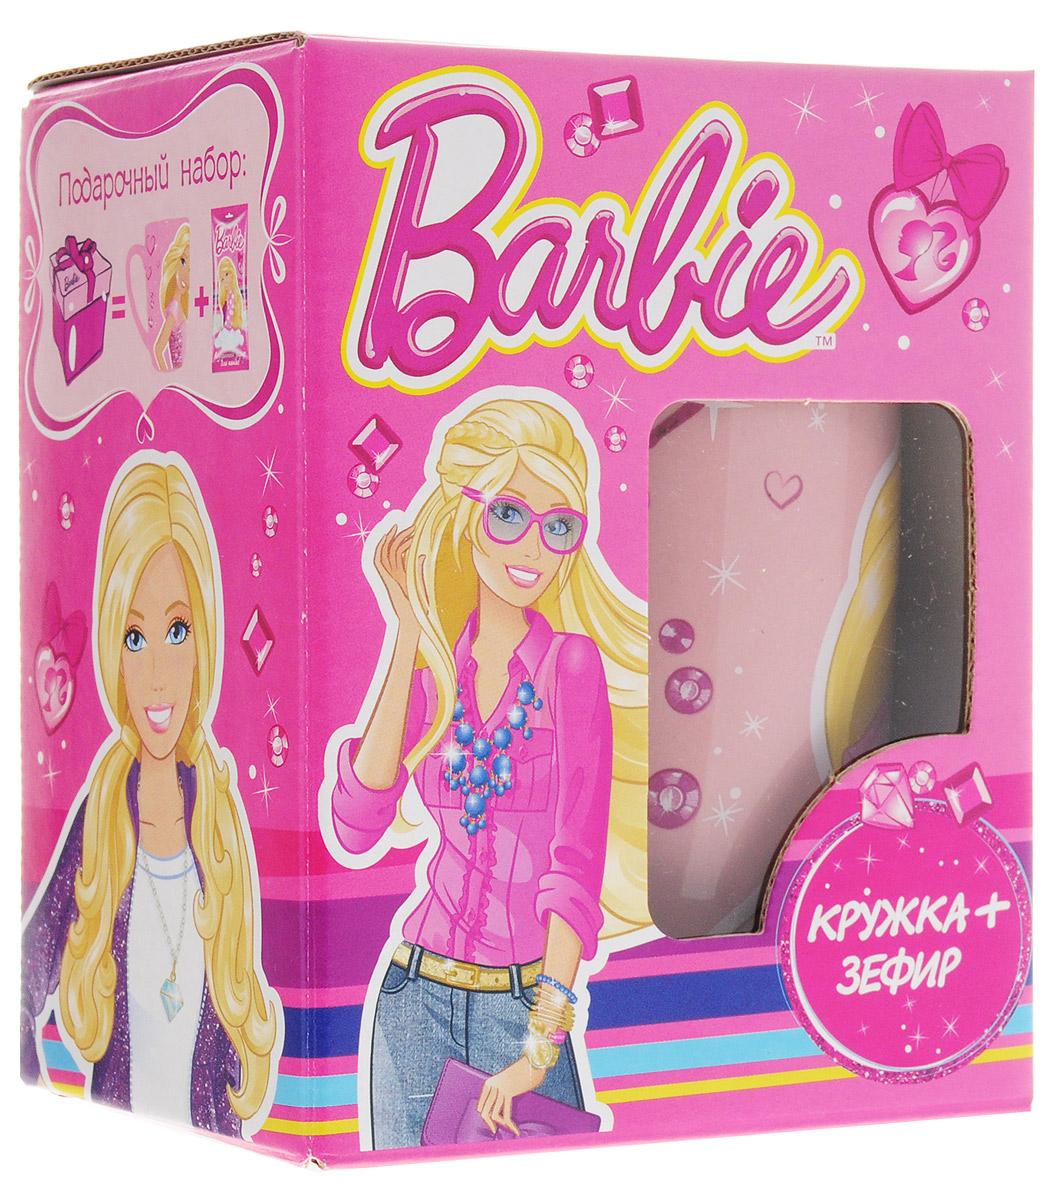 Barbie кружка с зефиром для какао, 15 г